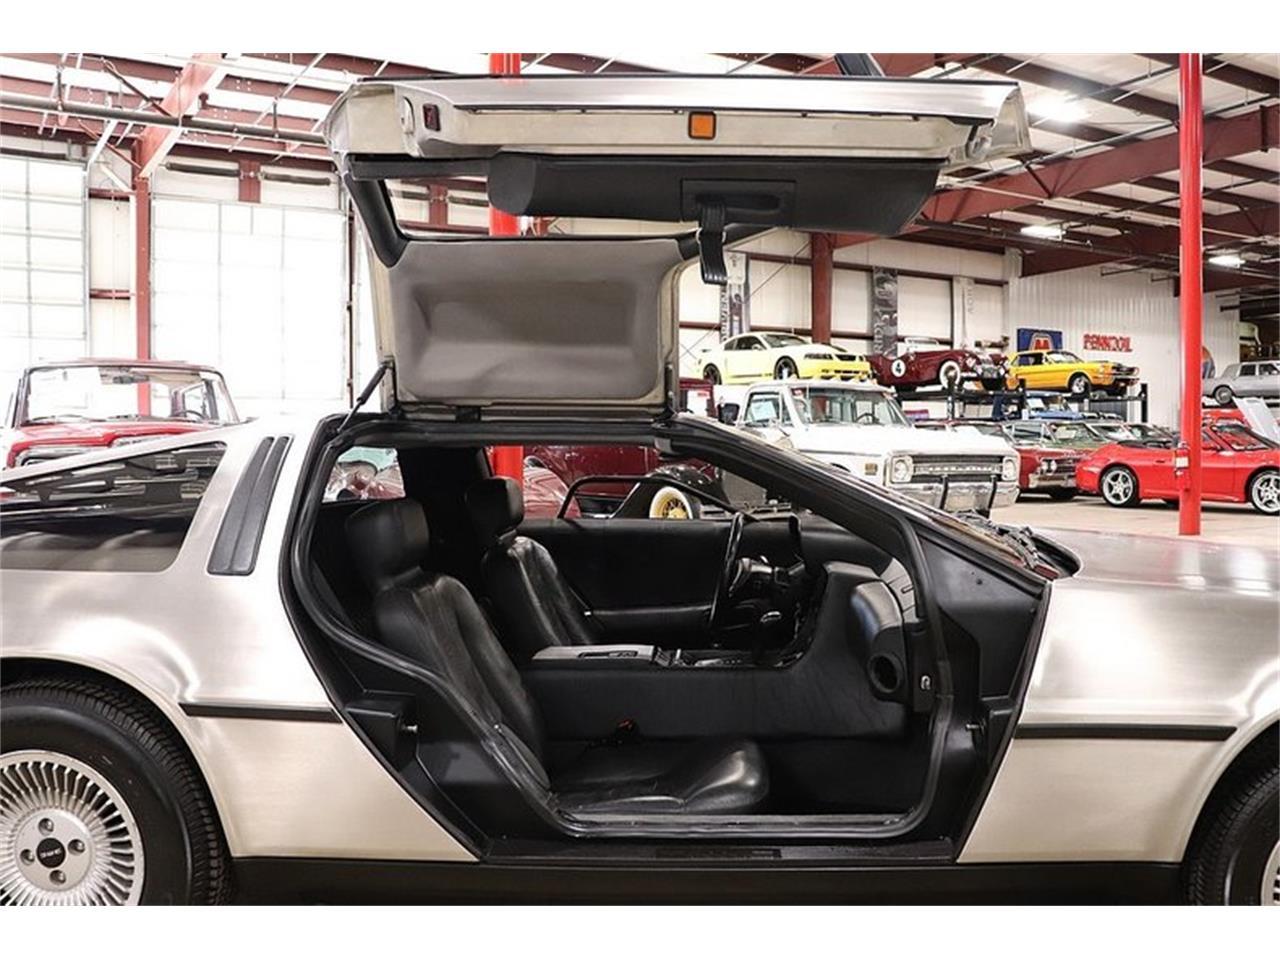 1981 DeLorean DMC-12 (CC-1133409) for sale in Kentwood, Michigan